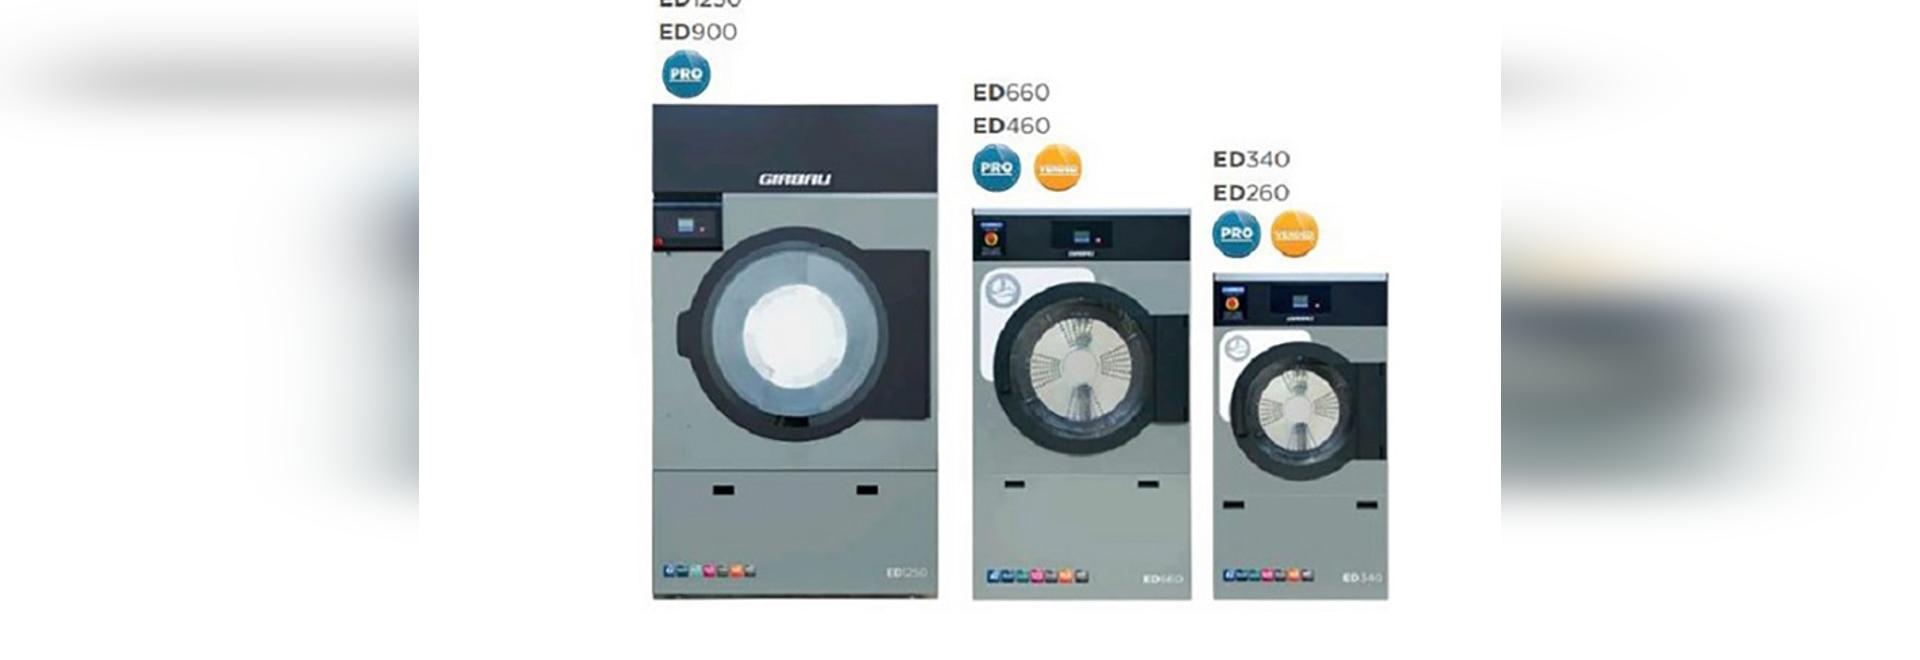 Girbau presents the new ED900 dryer